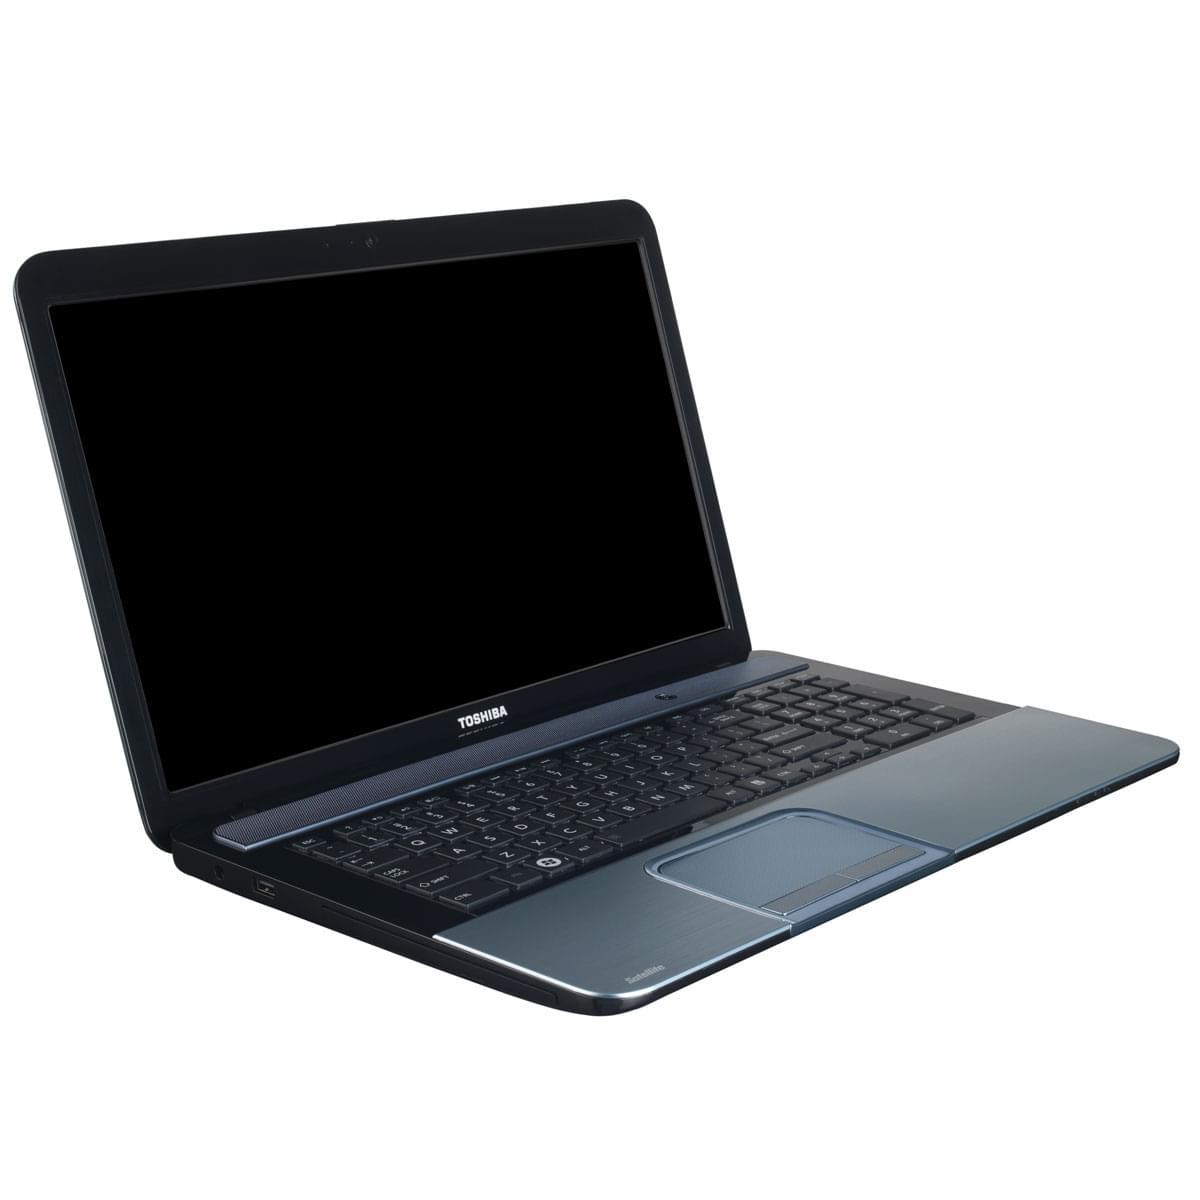 Toshiba L875-10EPDF (PSKBLE-002006FR) - Achat / Vente PC portable sur Cybertek.fr - 0